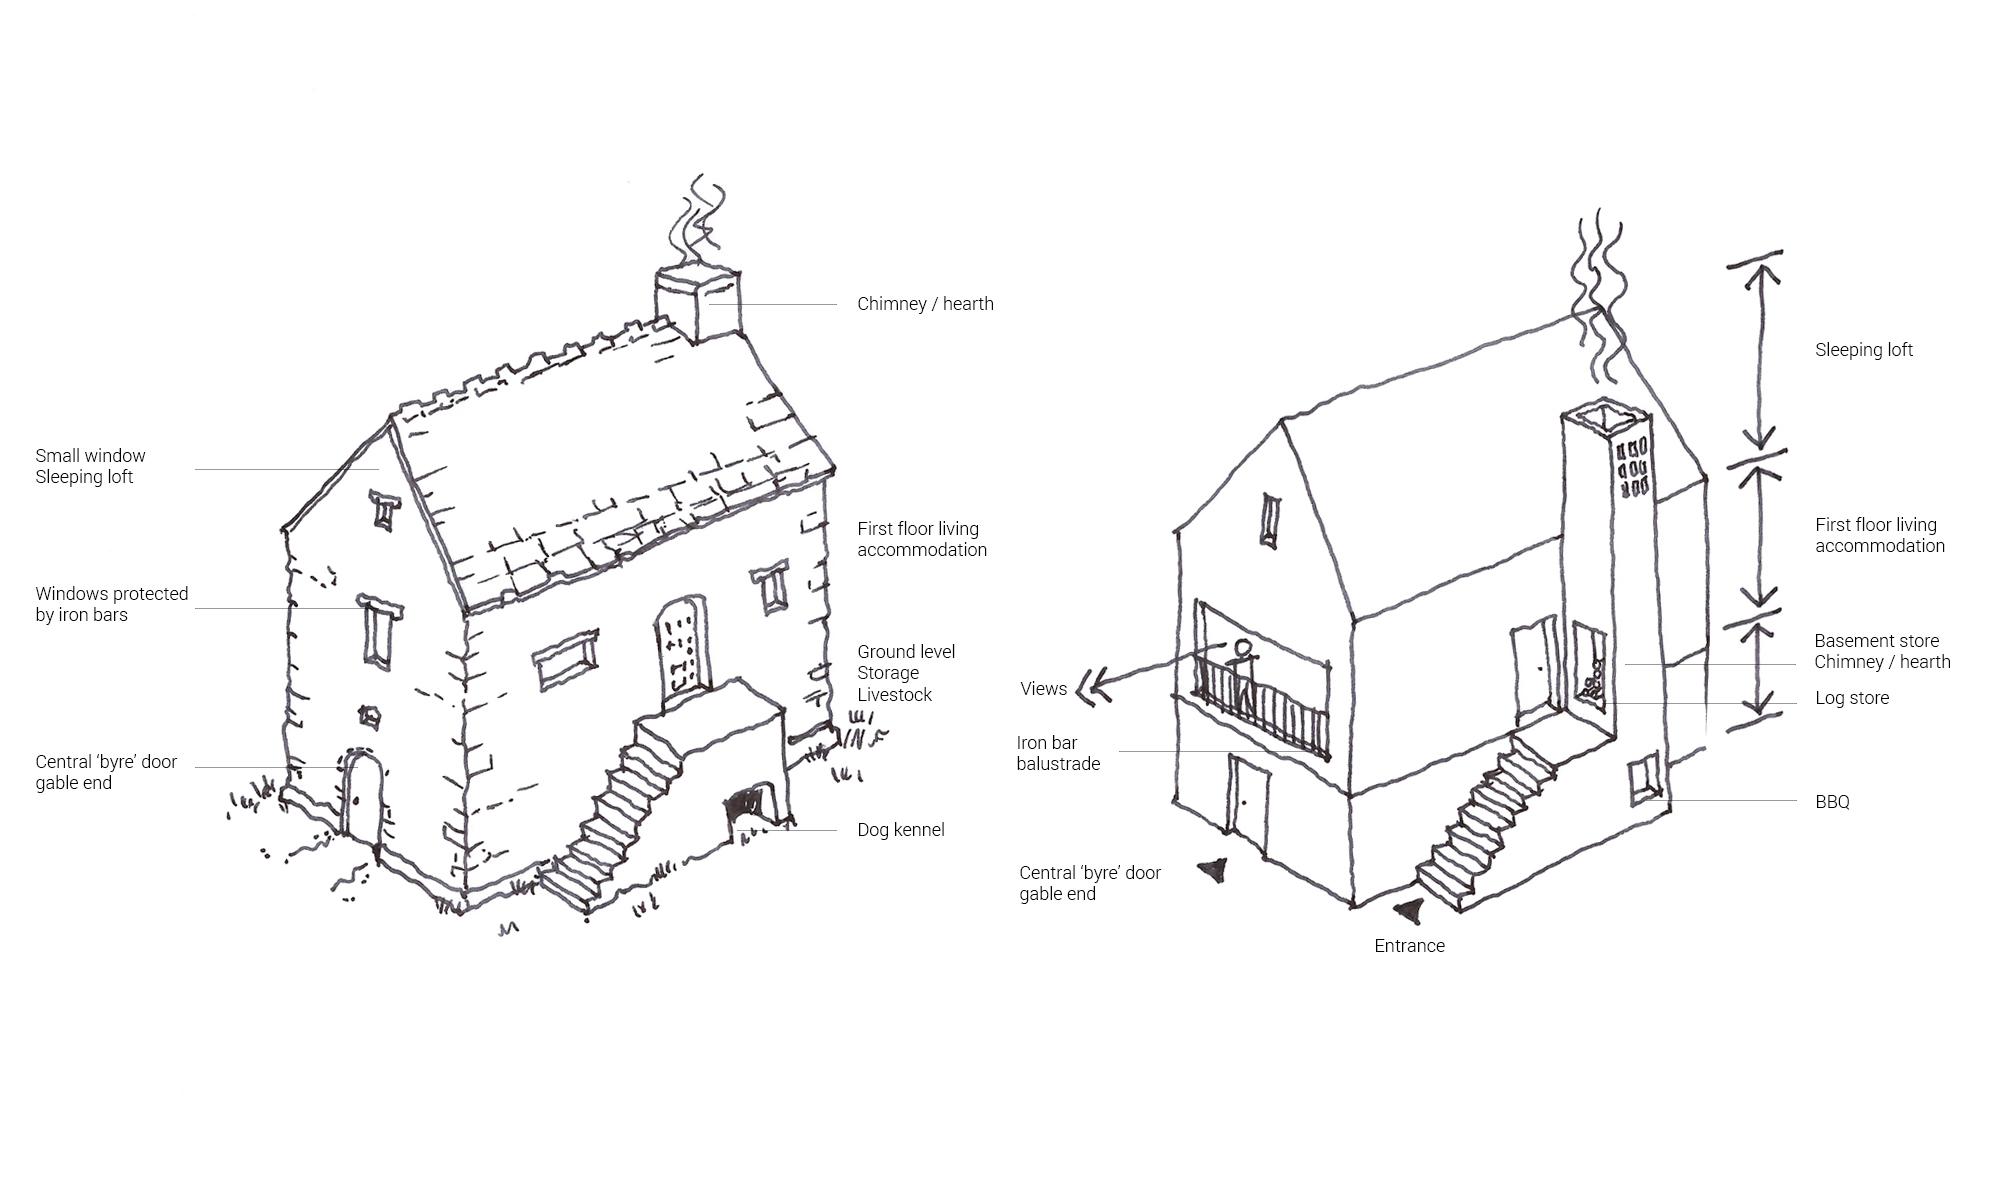 Hesleyside Walled Garden Sketch Comparison